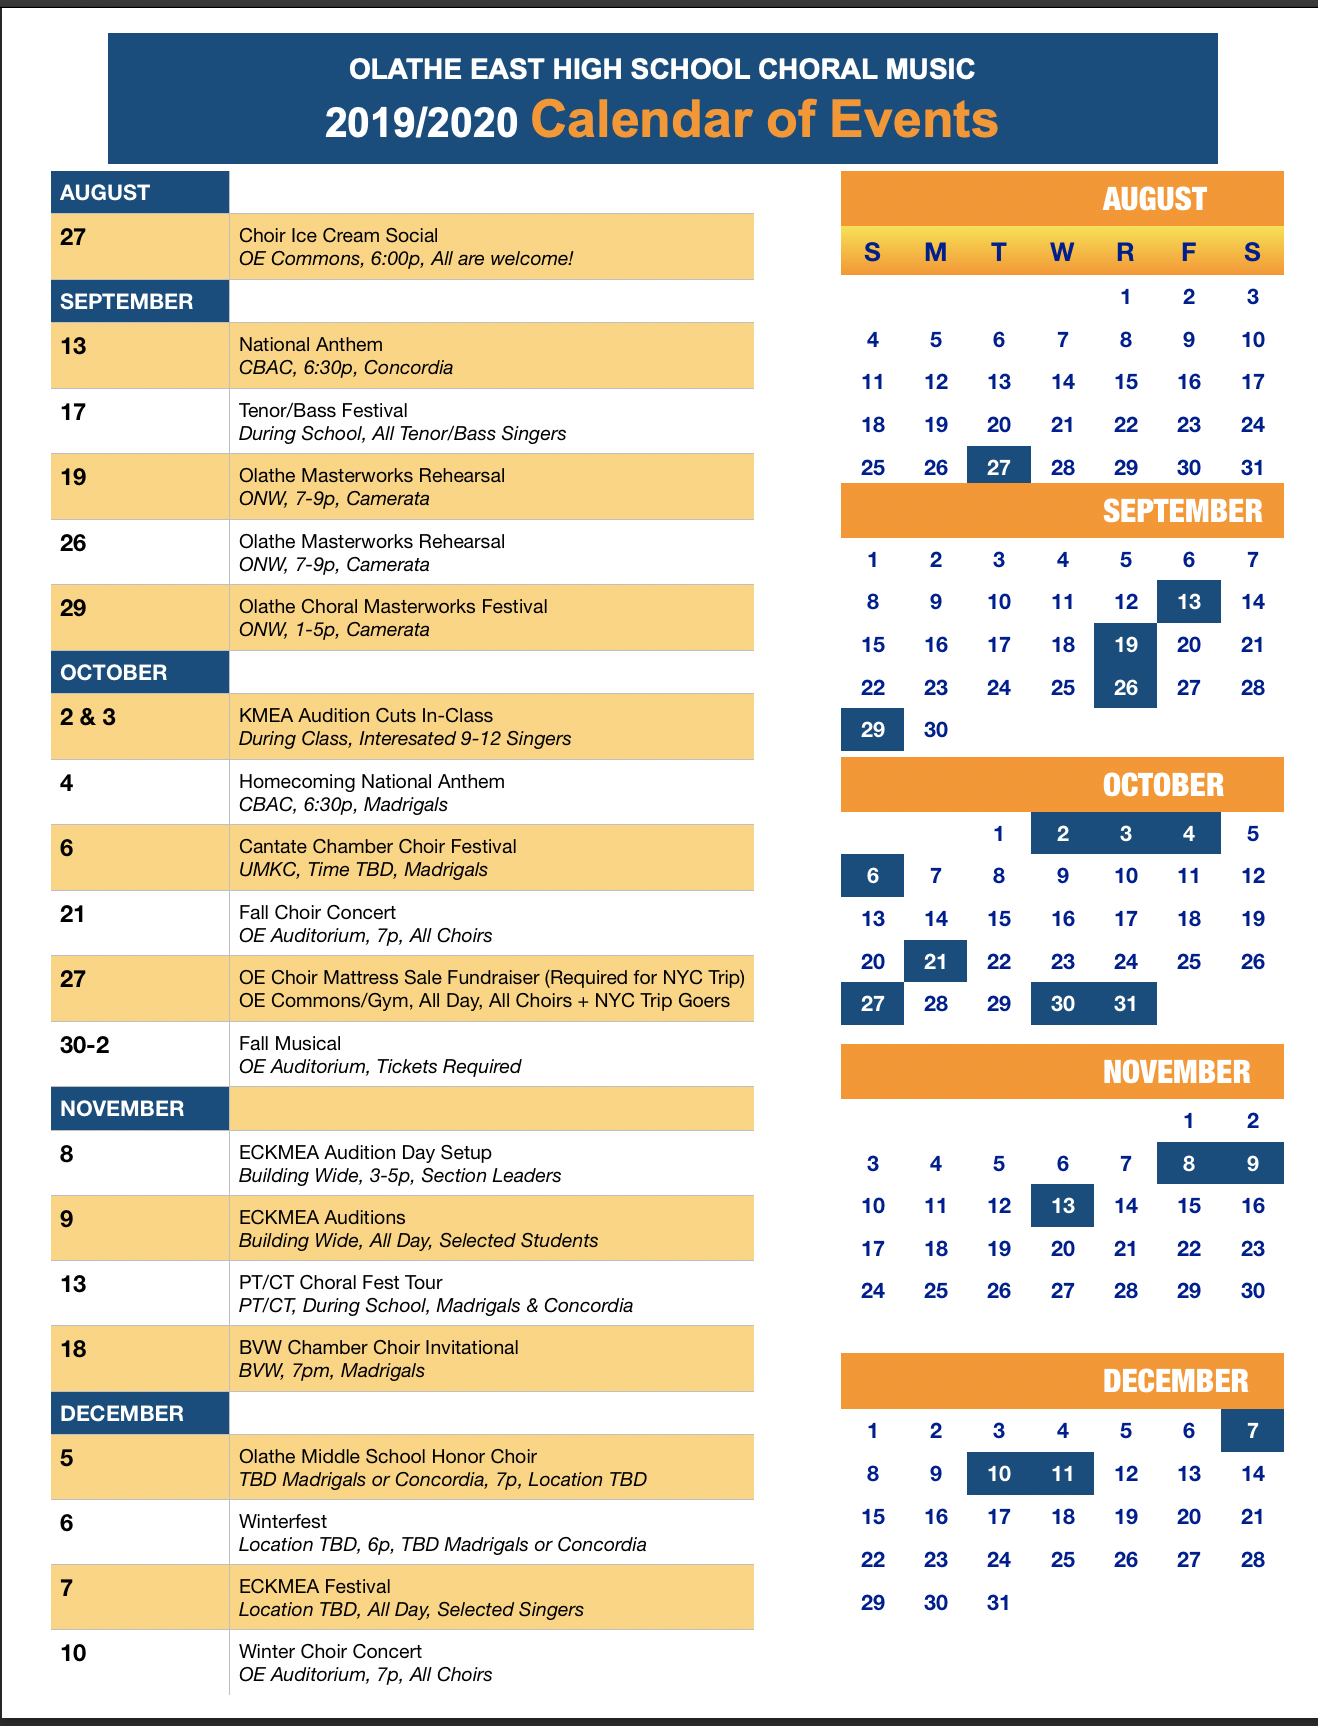 Calendar | Olathe East Choral Music Intended For East Orange H S Calendar